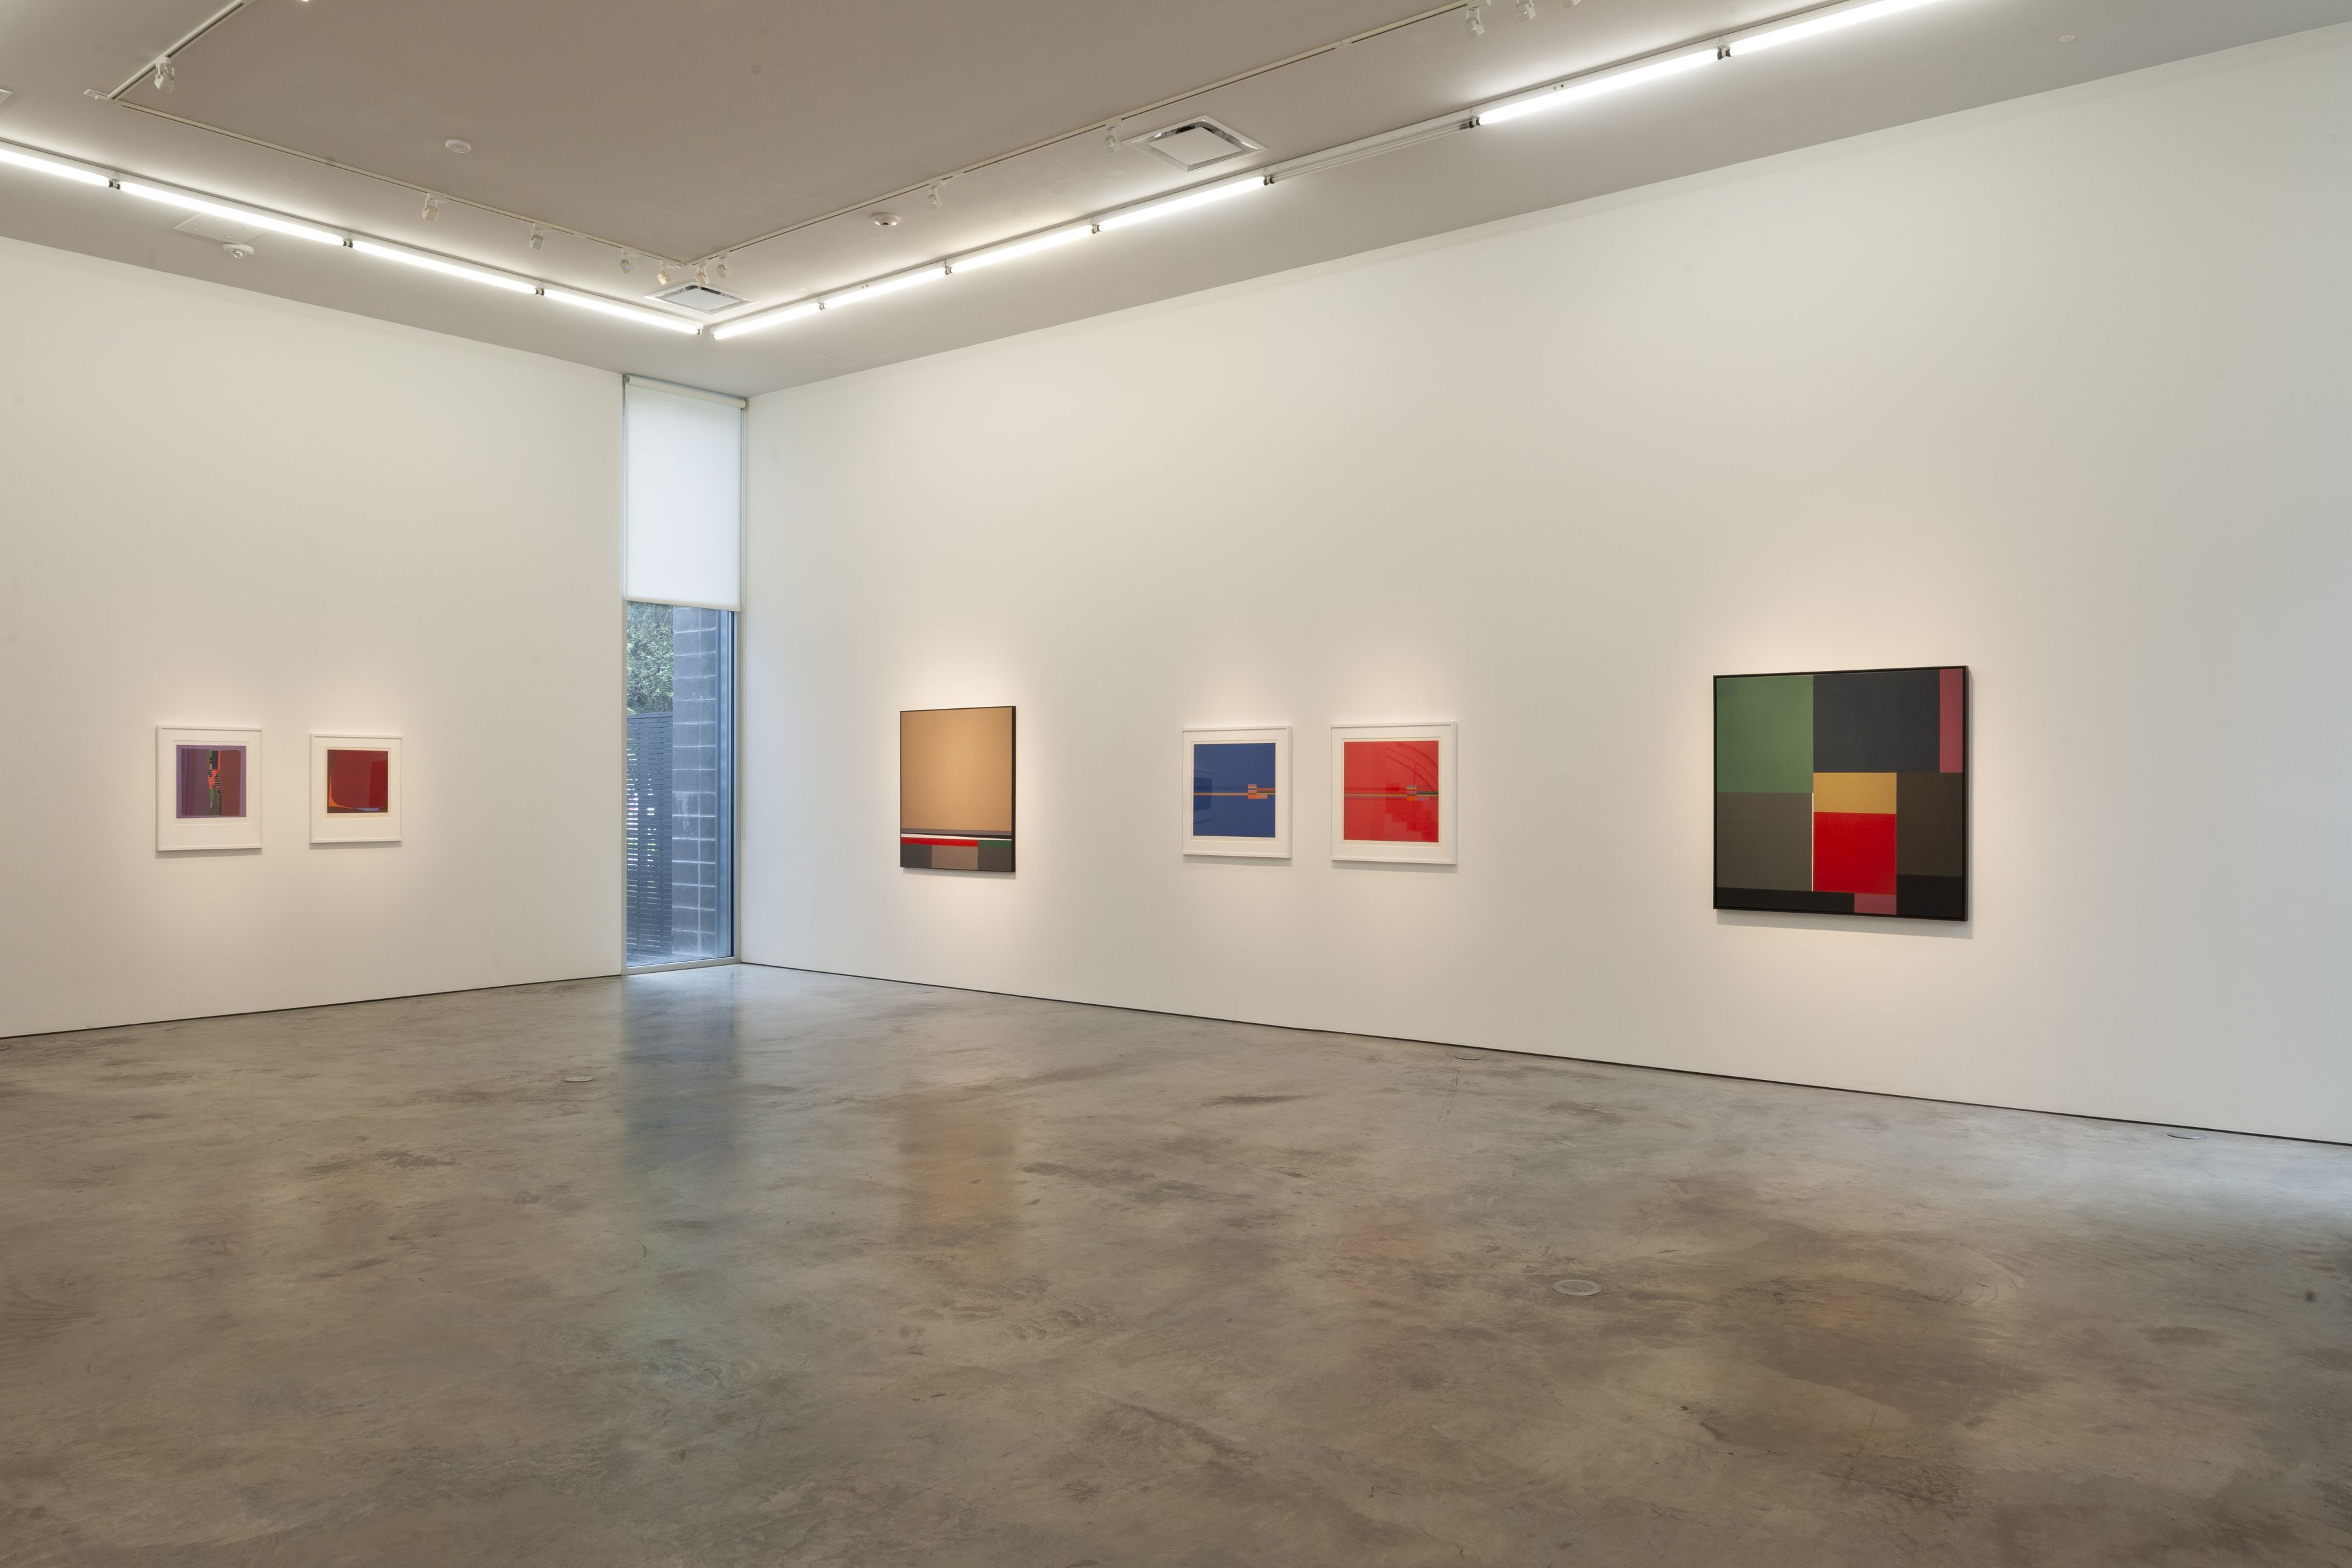 Mercedes Pardo,Beyond Color.Sicardi | Ayers | Bacino, 2018